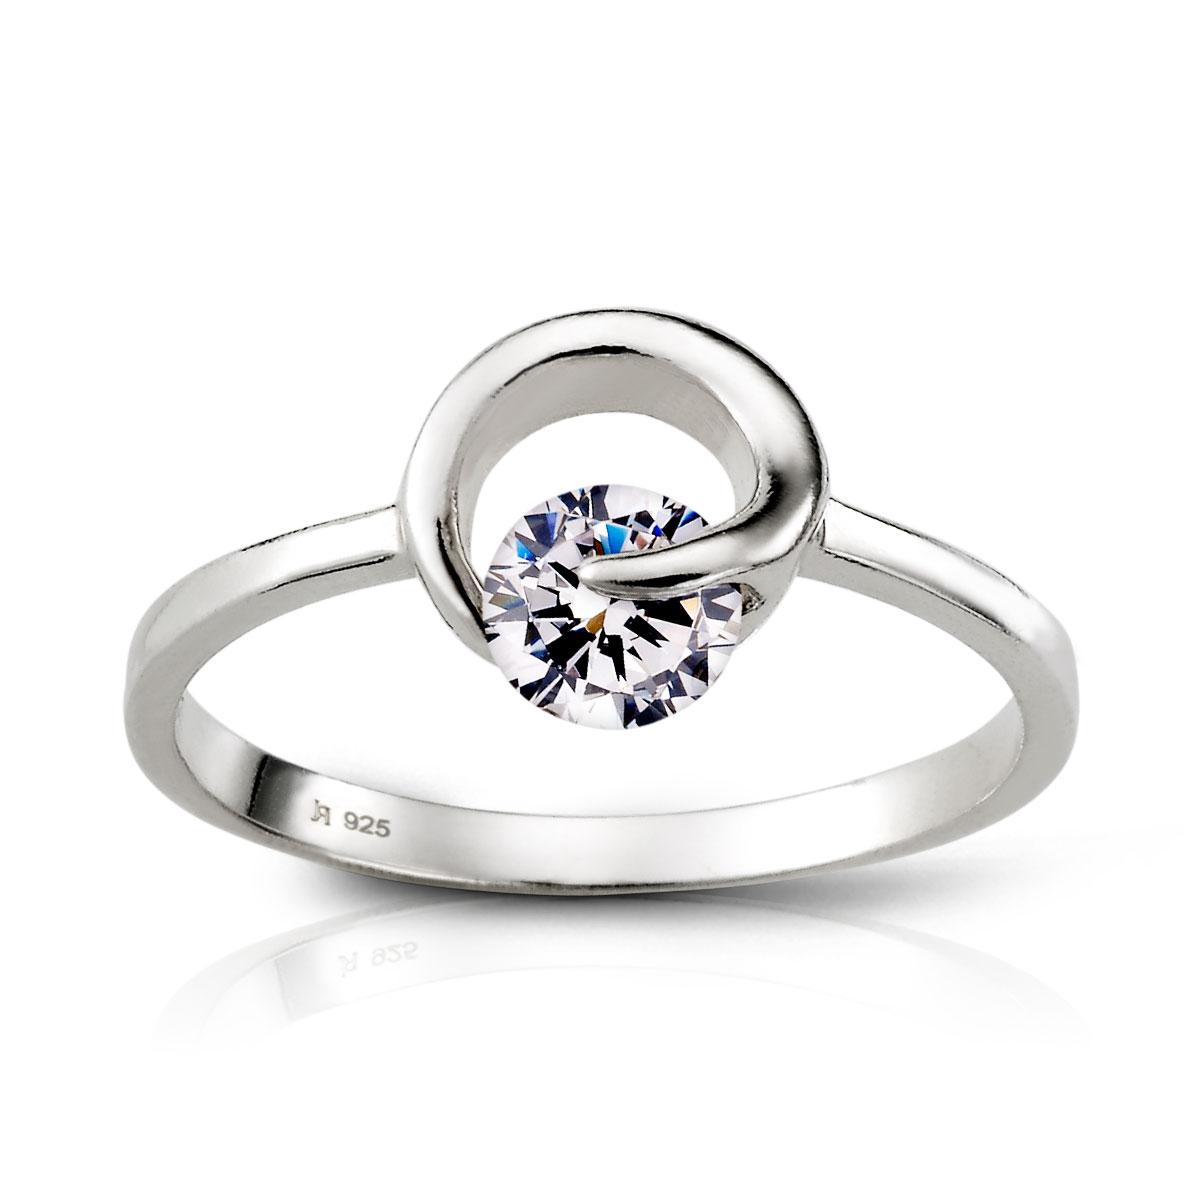 KSW16 都會女性環繞設計戒指